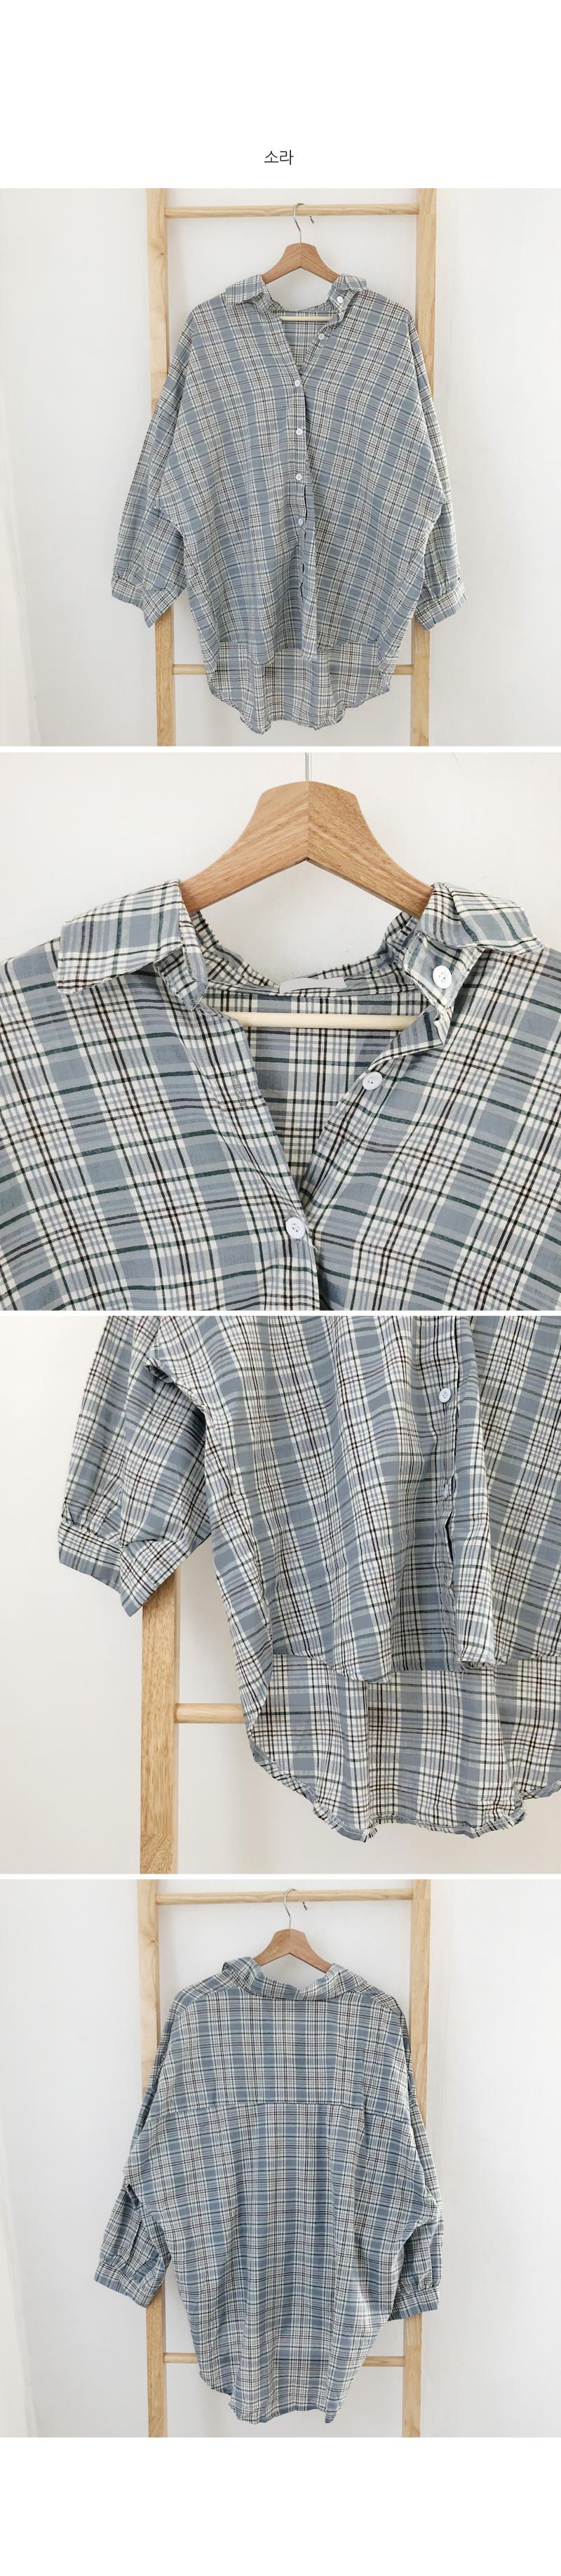 Vintage Check Overfit Shirt